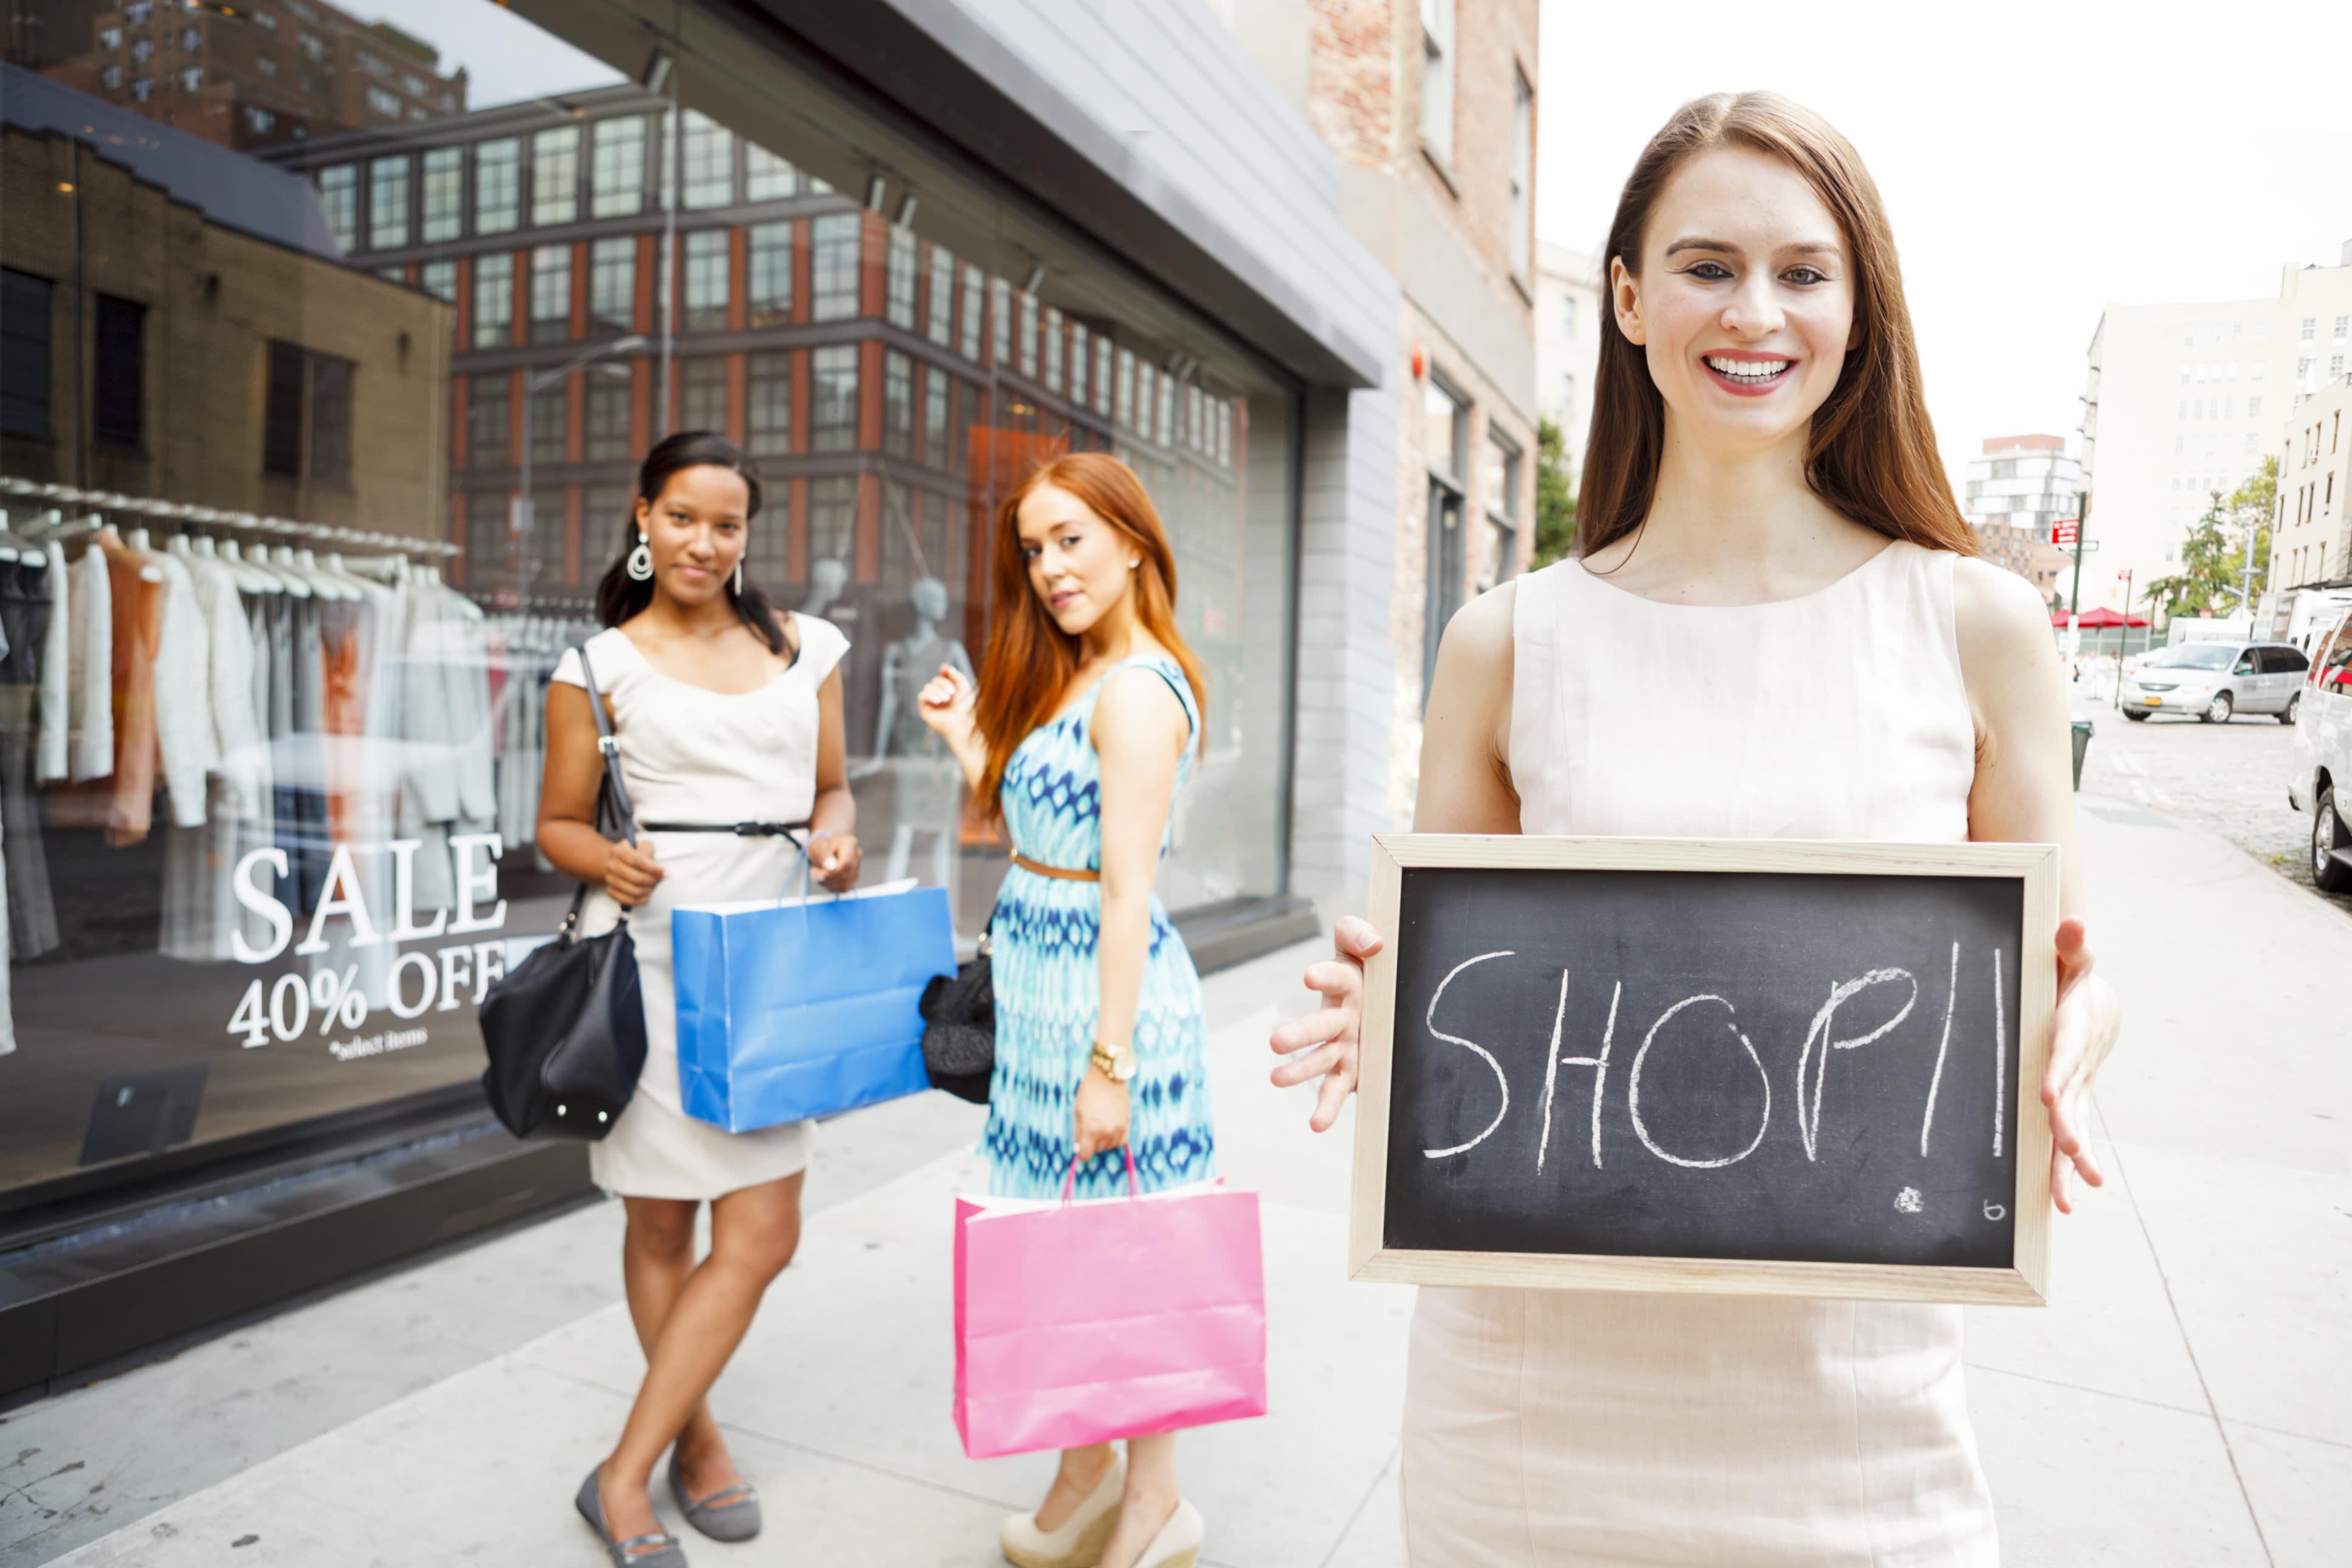 a2958fdd89c8c Shop  Til You Drop  Retail Therapy Works